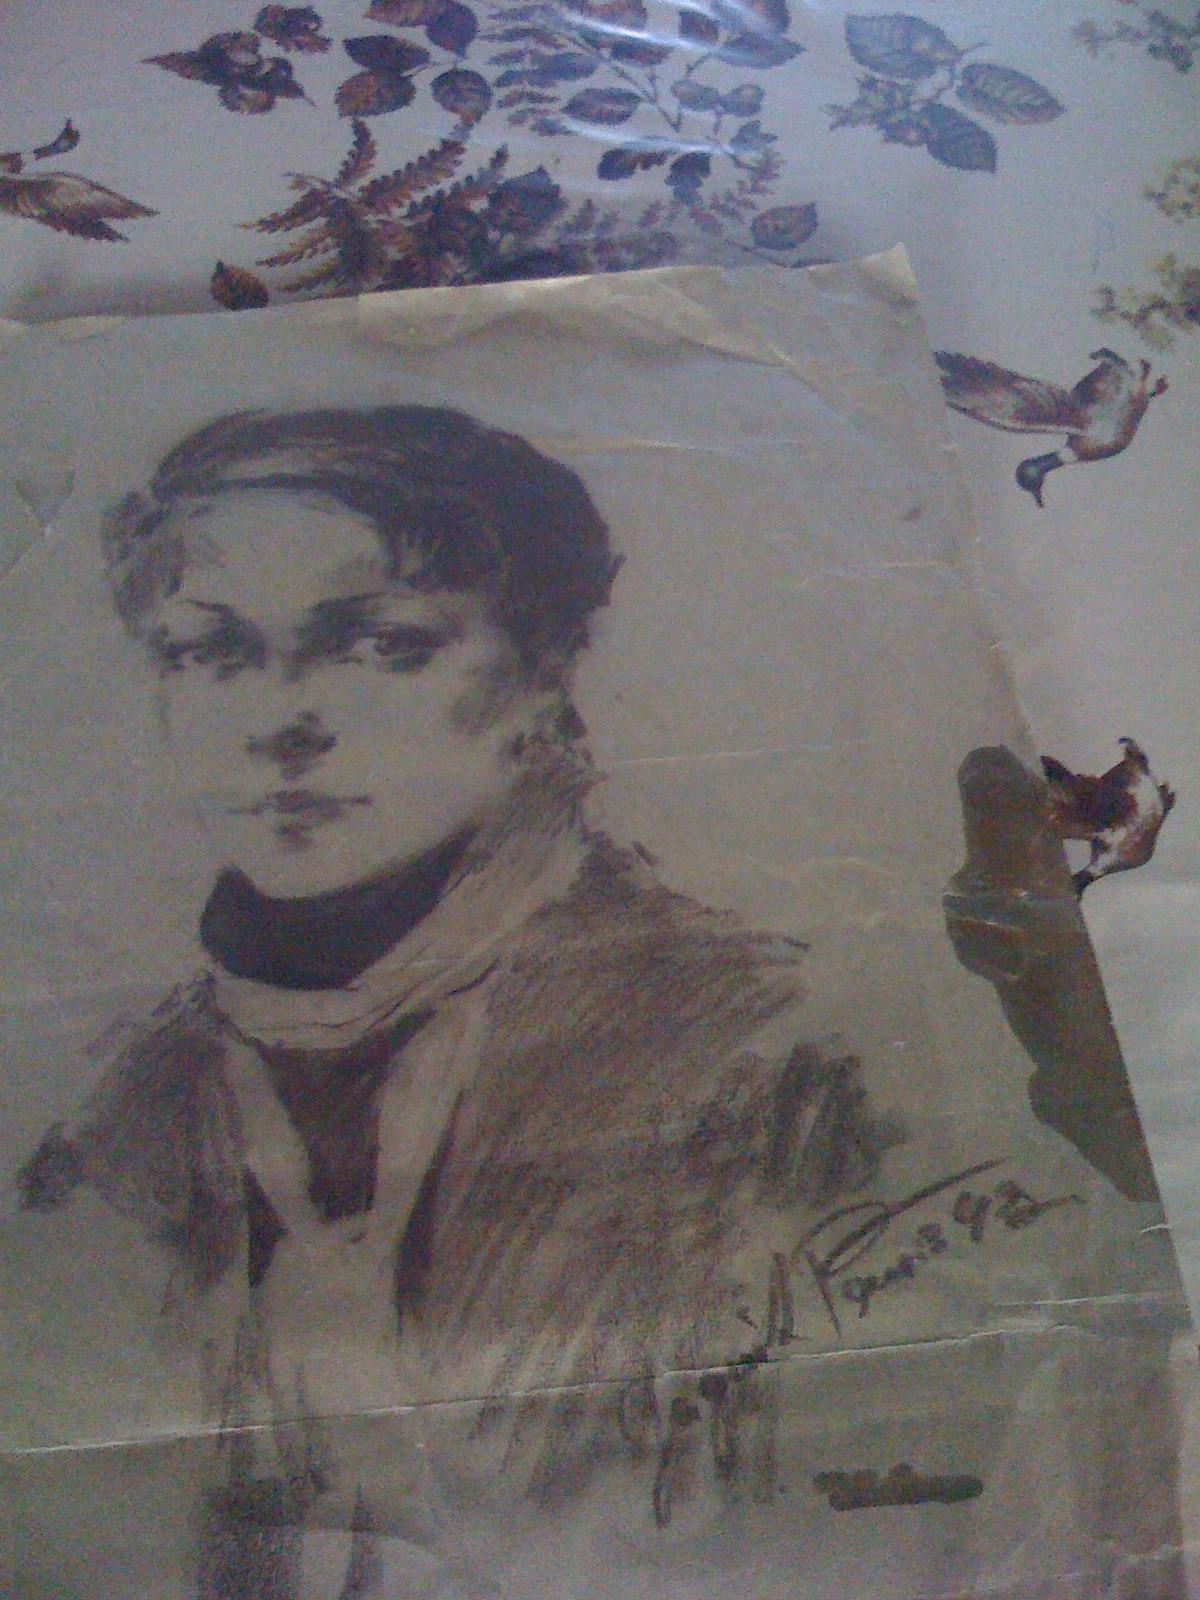 Isabelle Dufrene